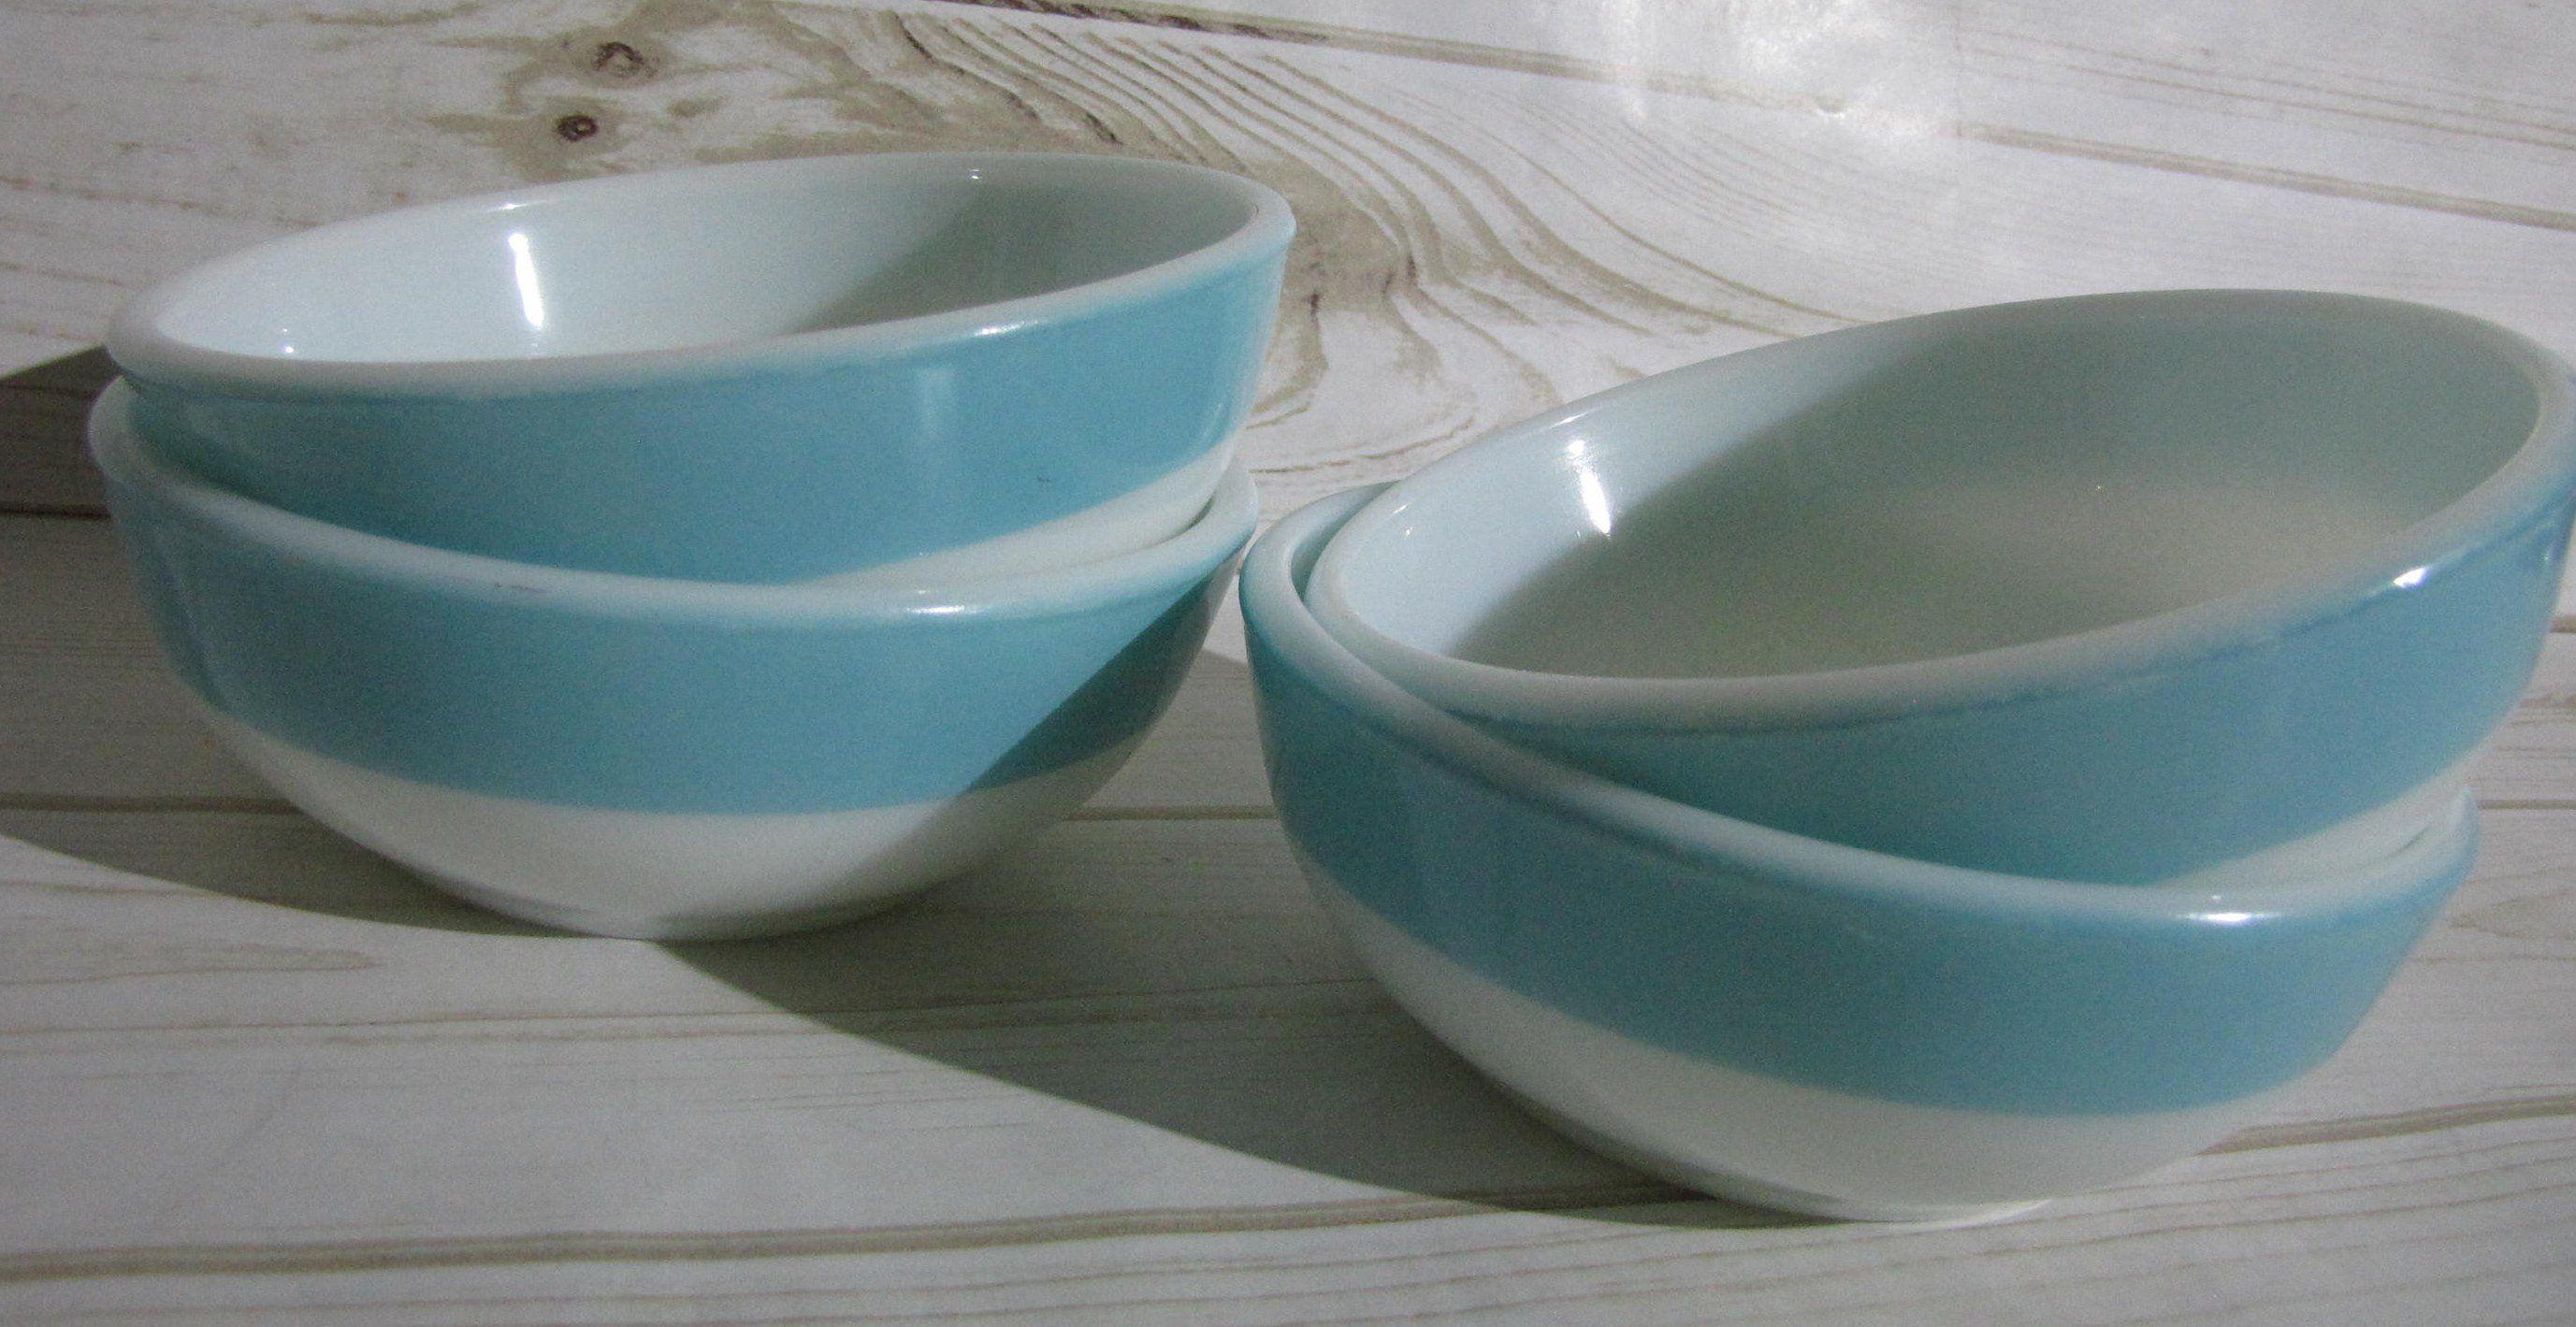 Pyrex Family Flair Sea Isle Blue Aqua Turquoise Bowl Cereal Bowl